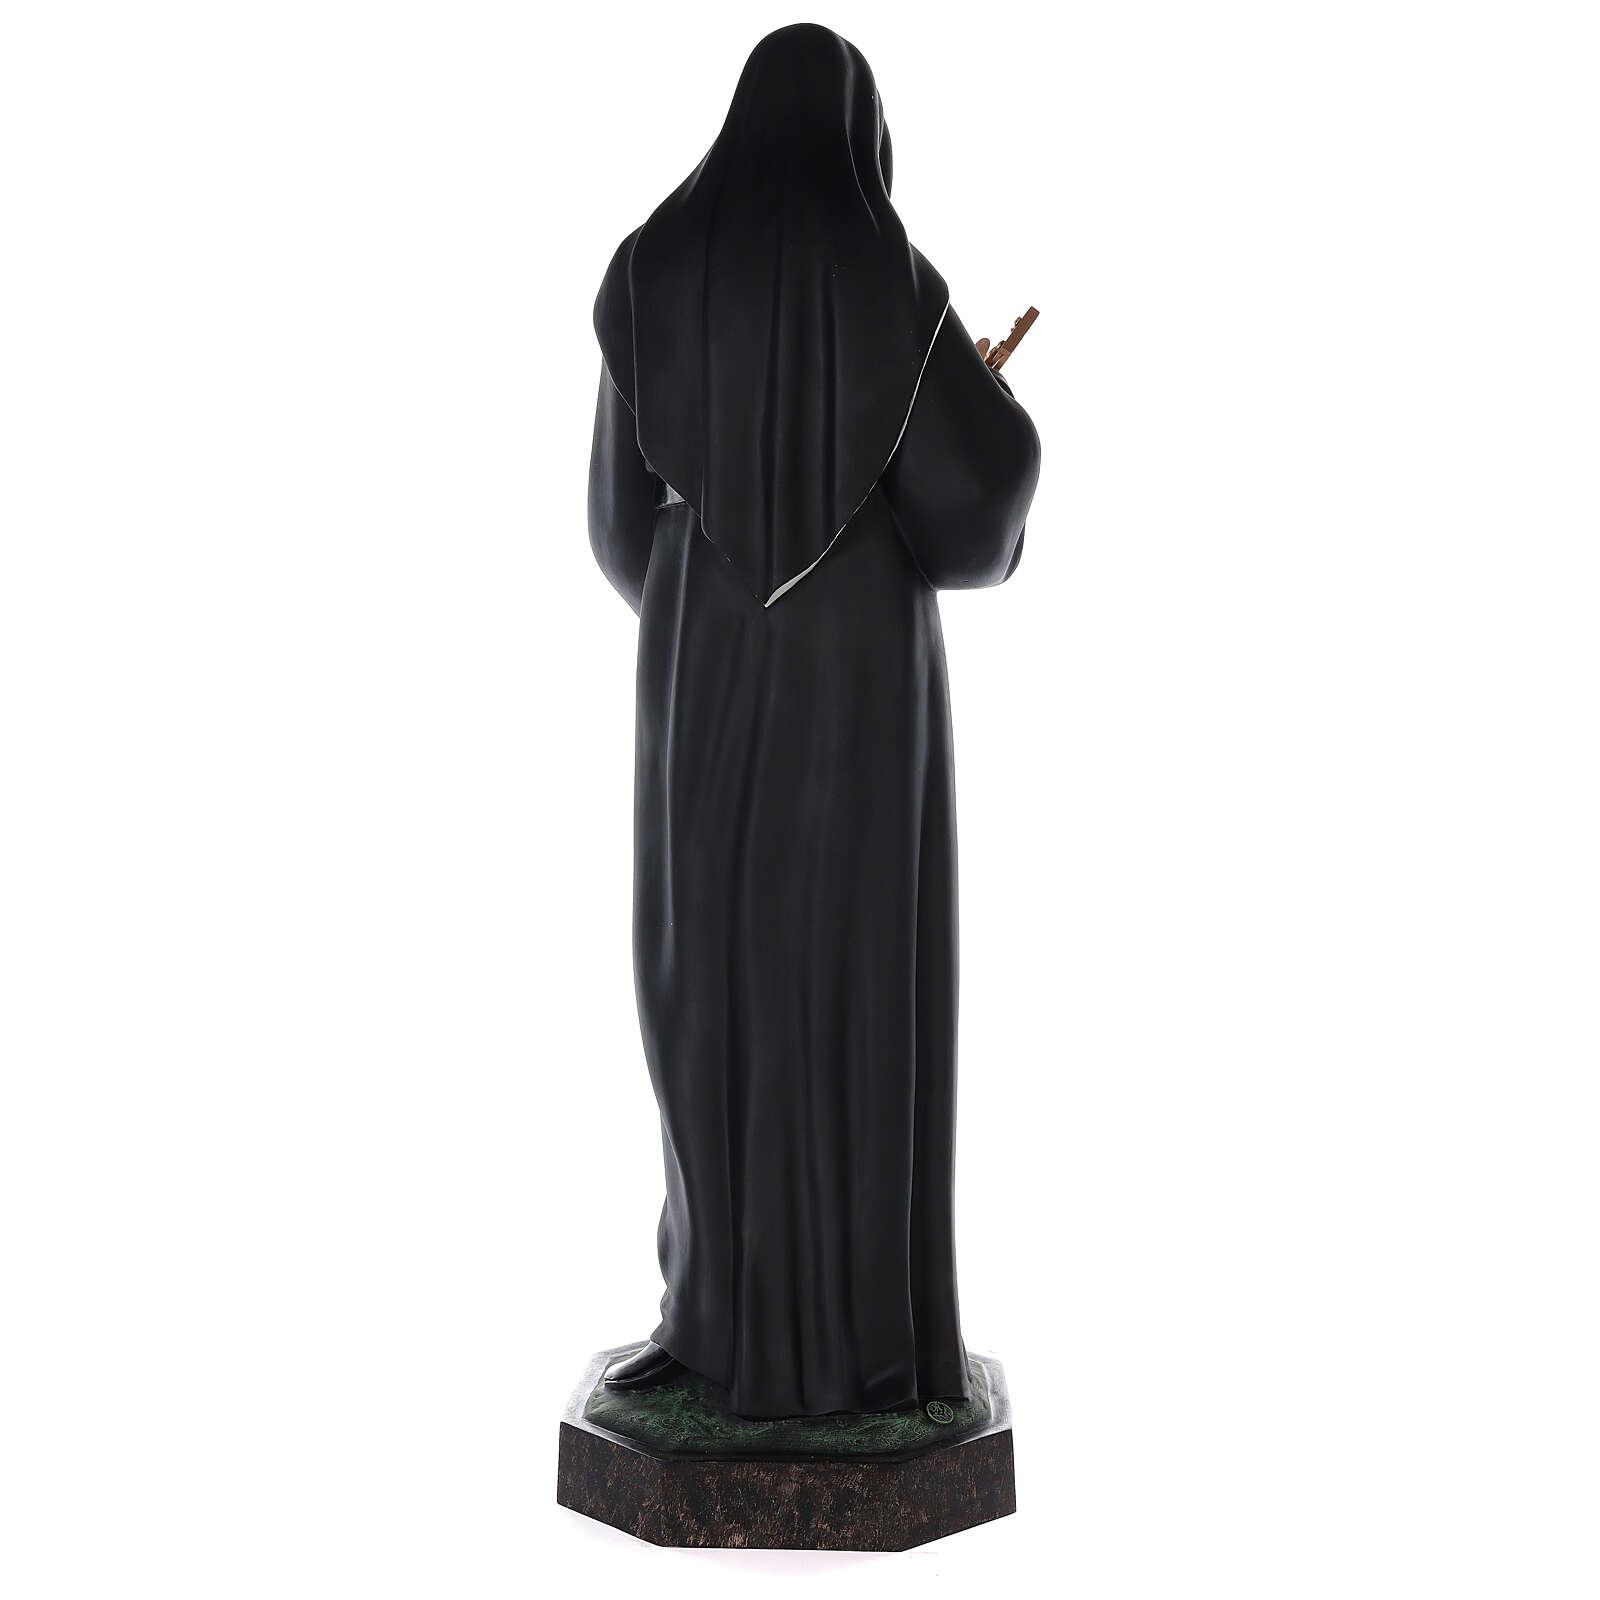 Statua Santa Rita vetroresina colorata 100 cm occhi vetro 4